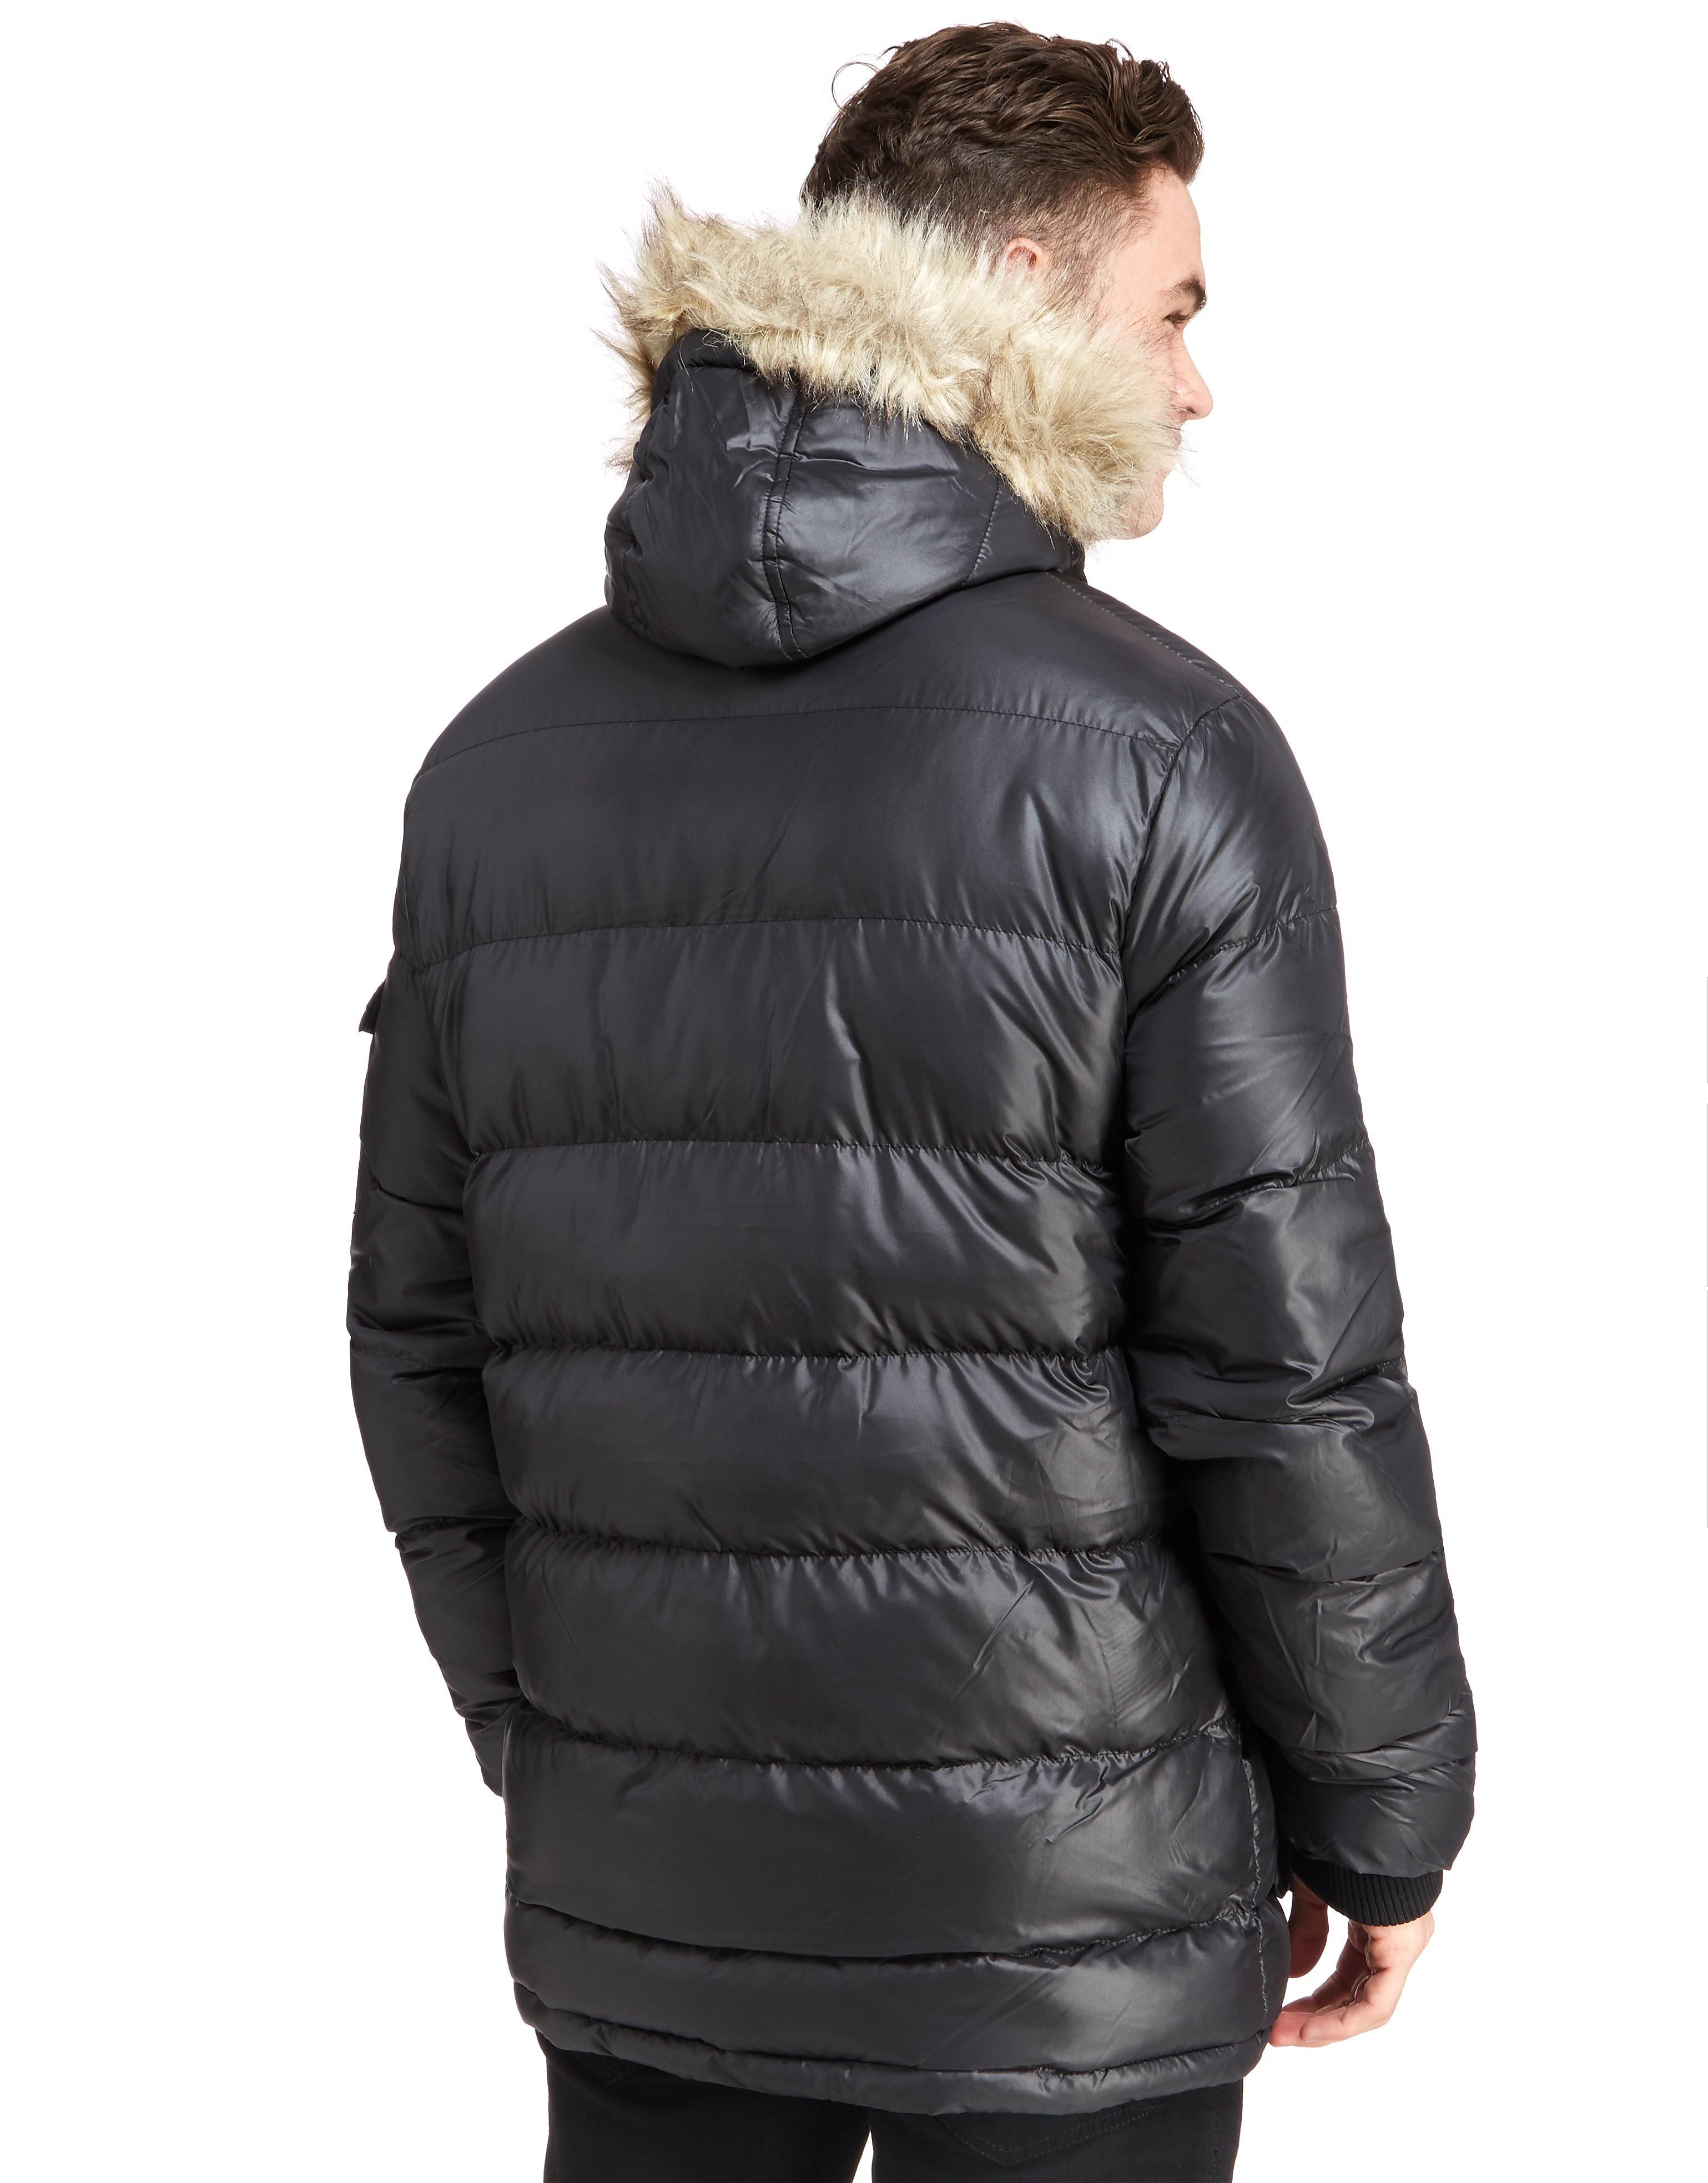 Supply & Demand Paramount Jacket